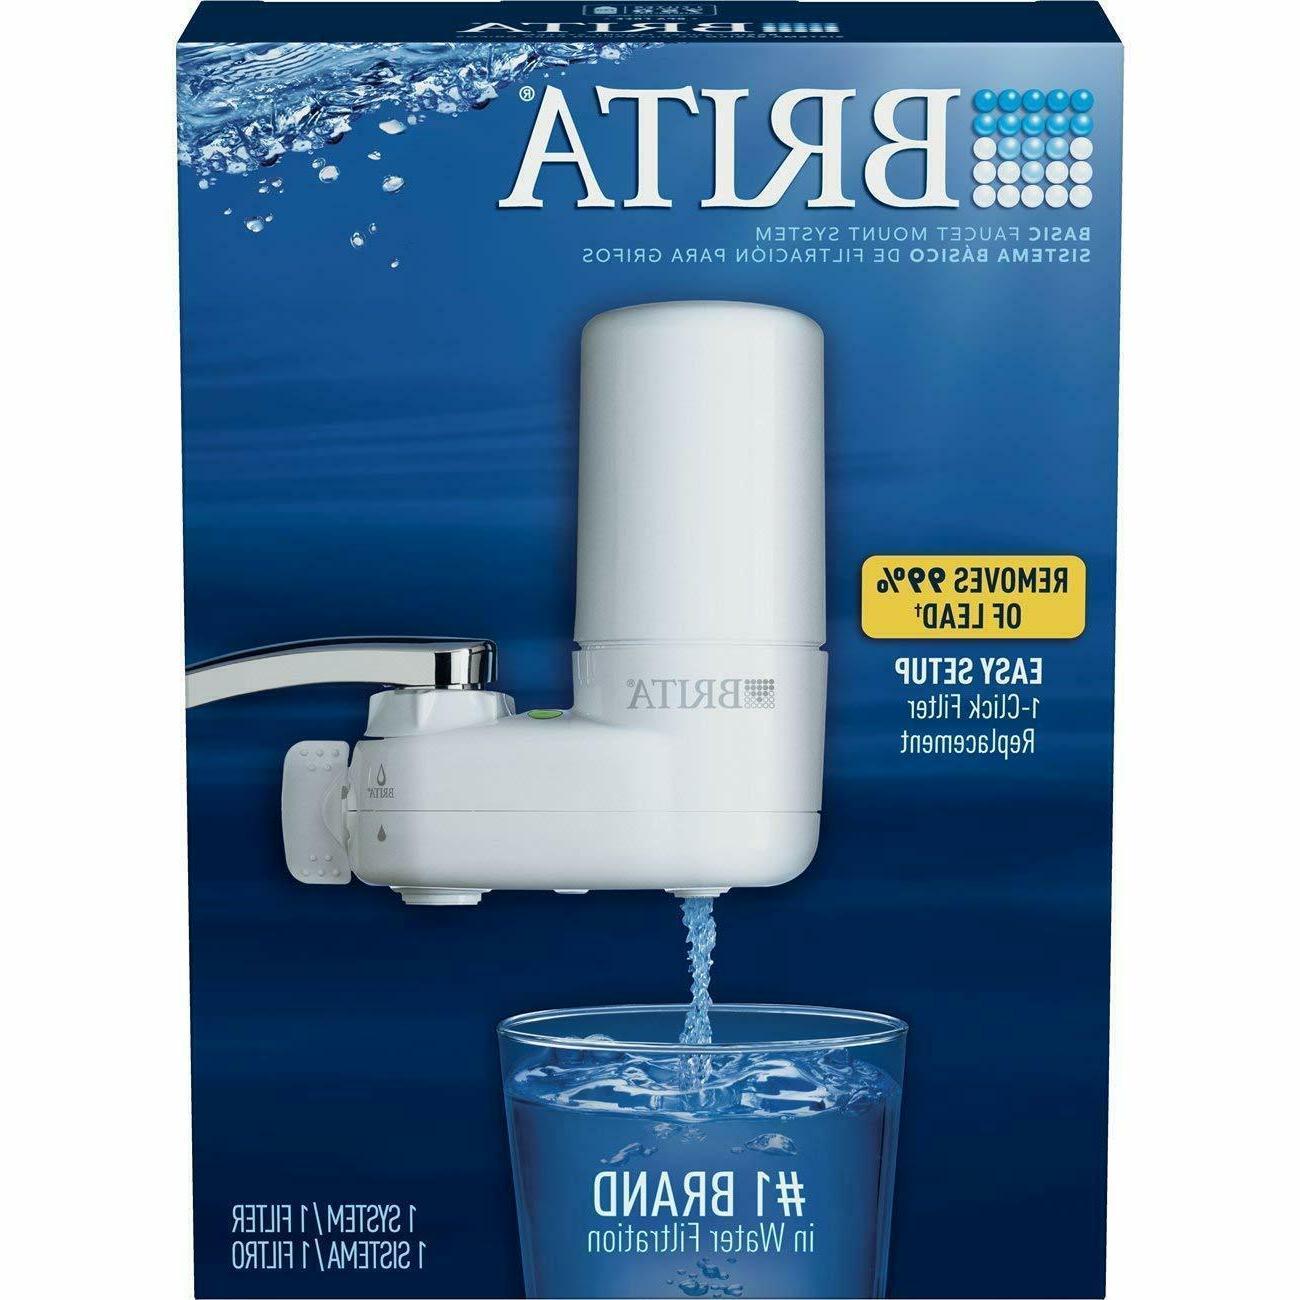 Brita Water System Water Faucet w/ Filter